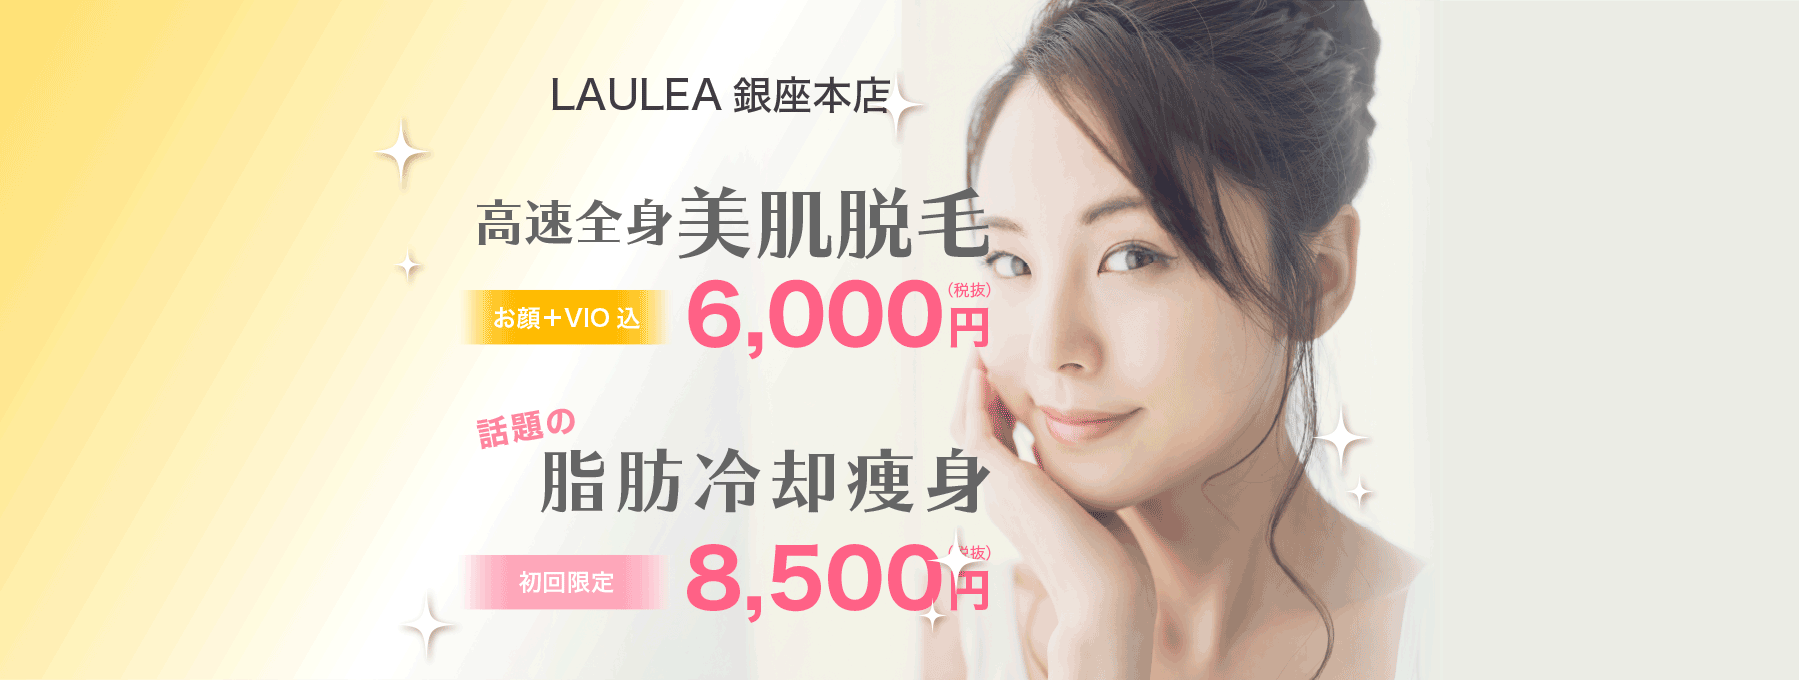 LAULEA銀座本店 人気no.1 お顔脱毛×2回(2か月間)6000円